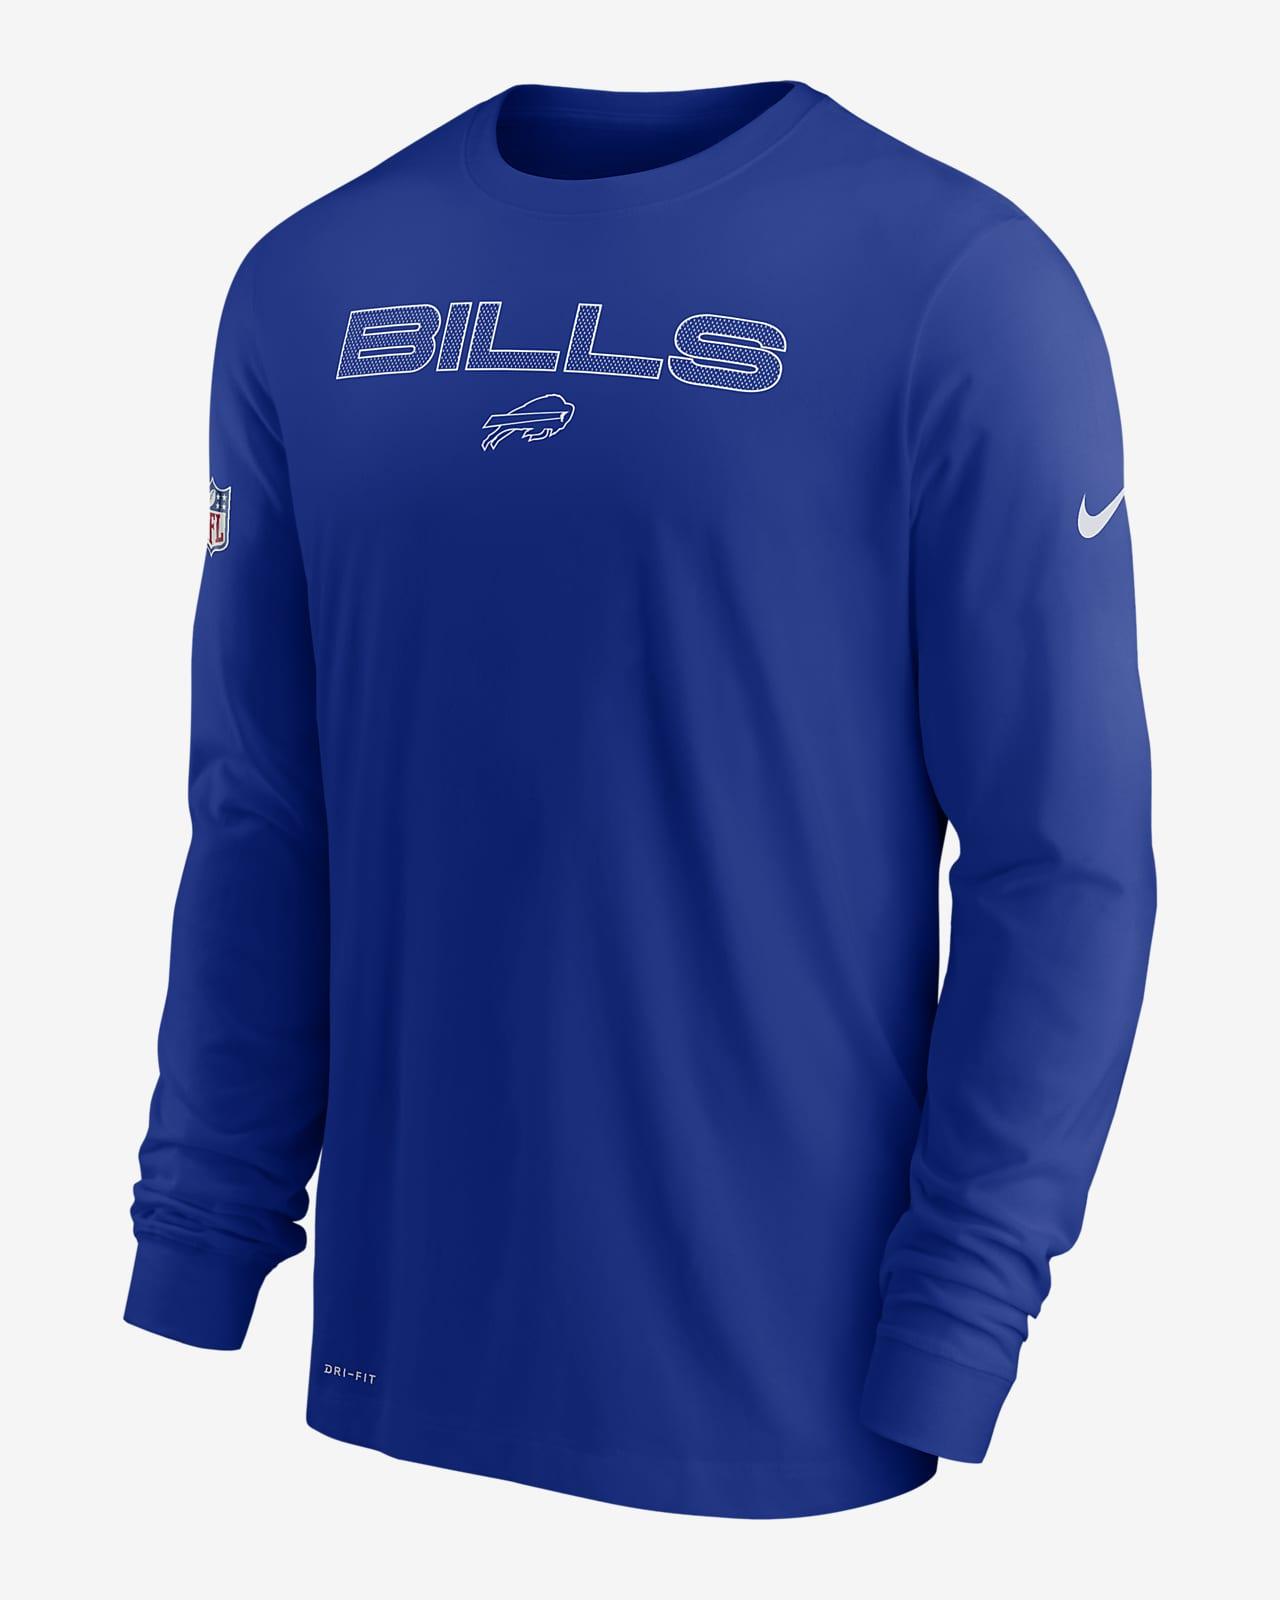 nike bills jersey